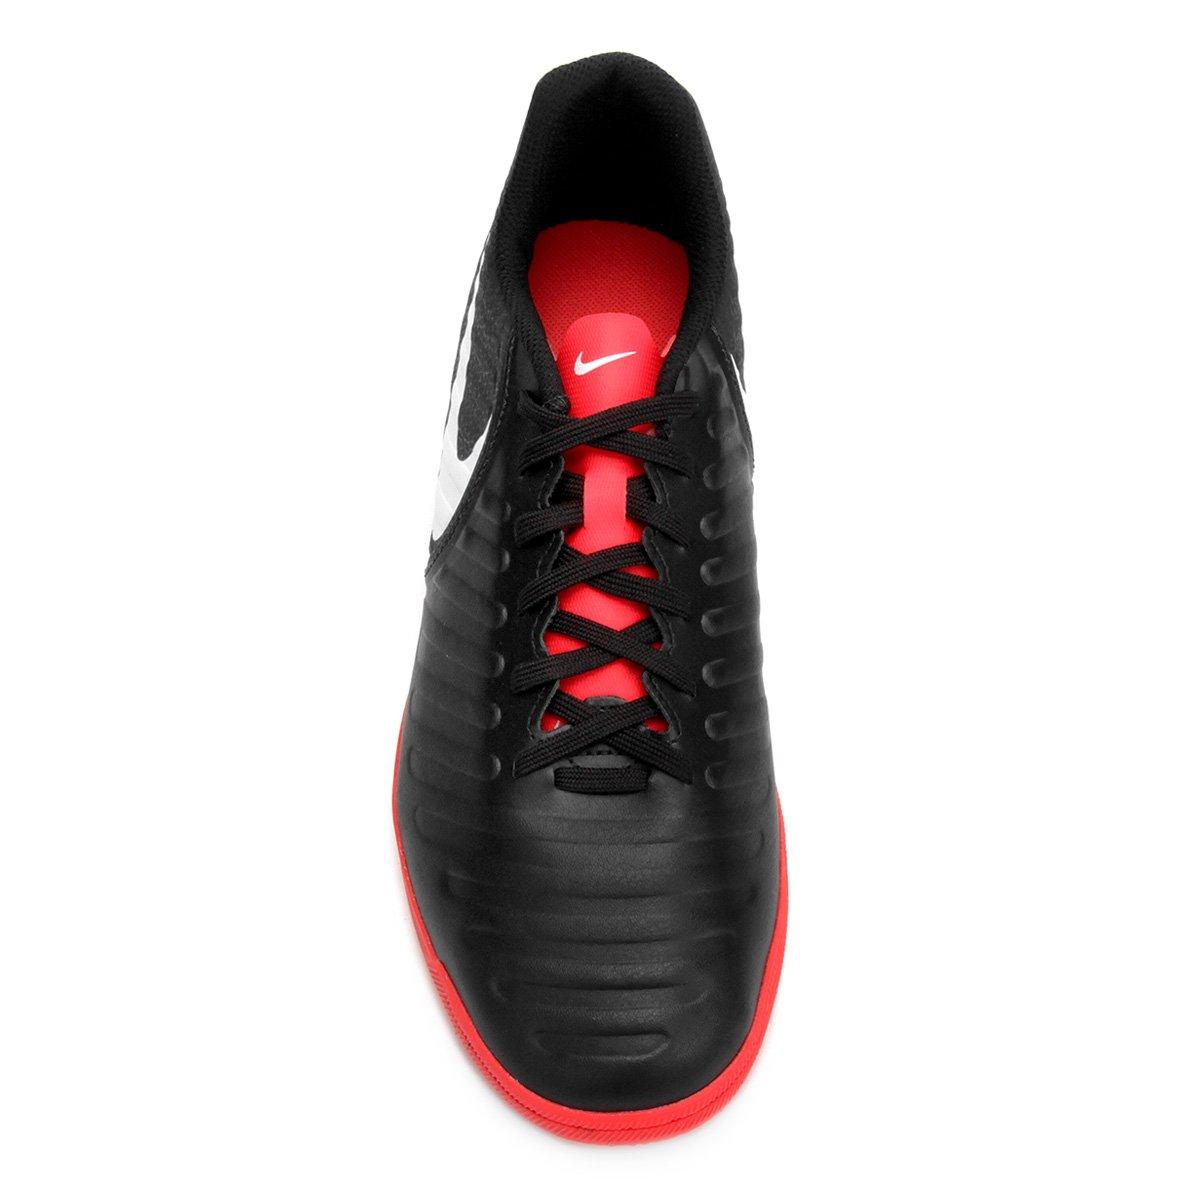 7 Masculina Legend Nike Tiempo Chuteira Cinza Club Futsal IC w4fqO1Oz